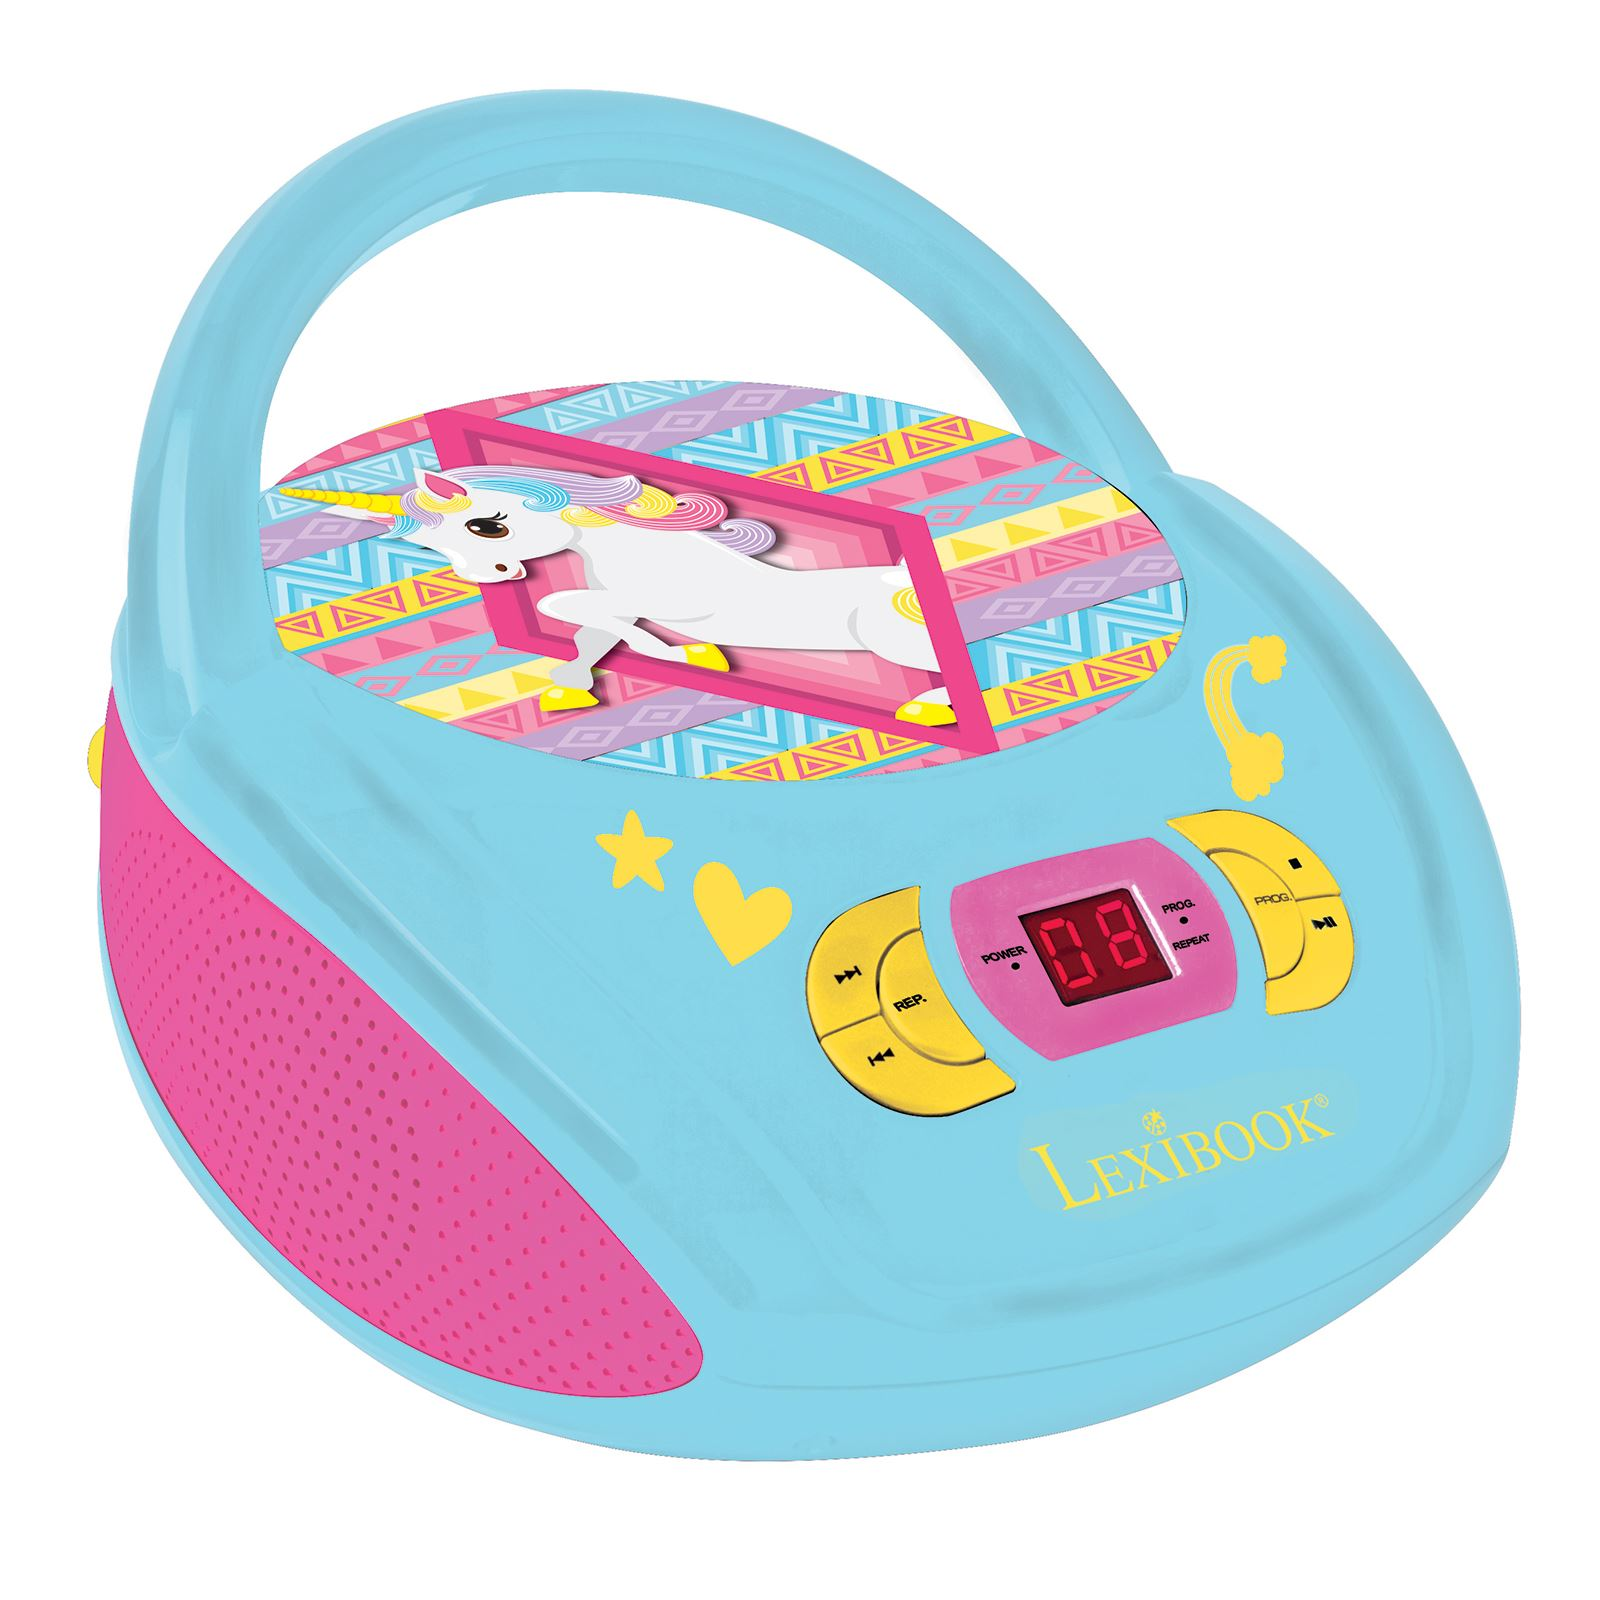 einhorn lexibook tragbar fm radio cd player blau rosa ebay. Black Bedroom Furniture Sets. Home Design Ideas